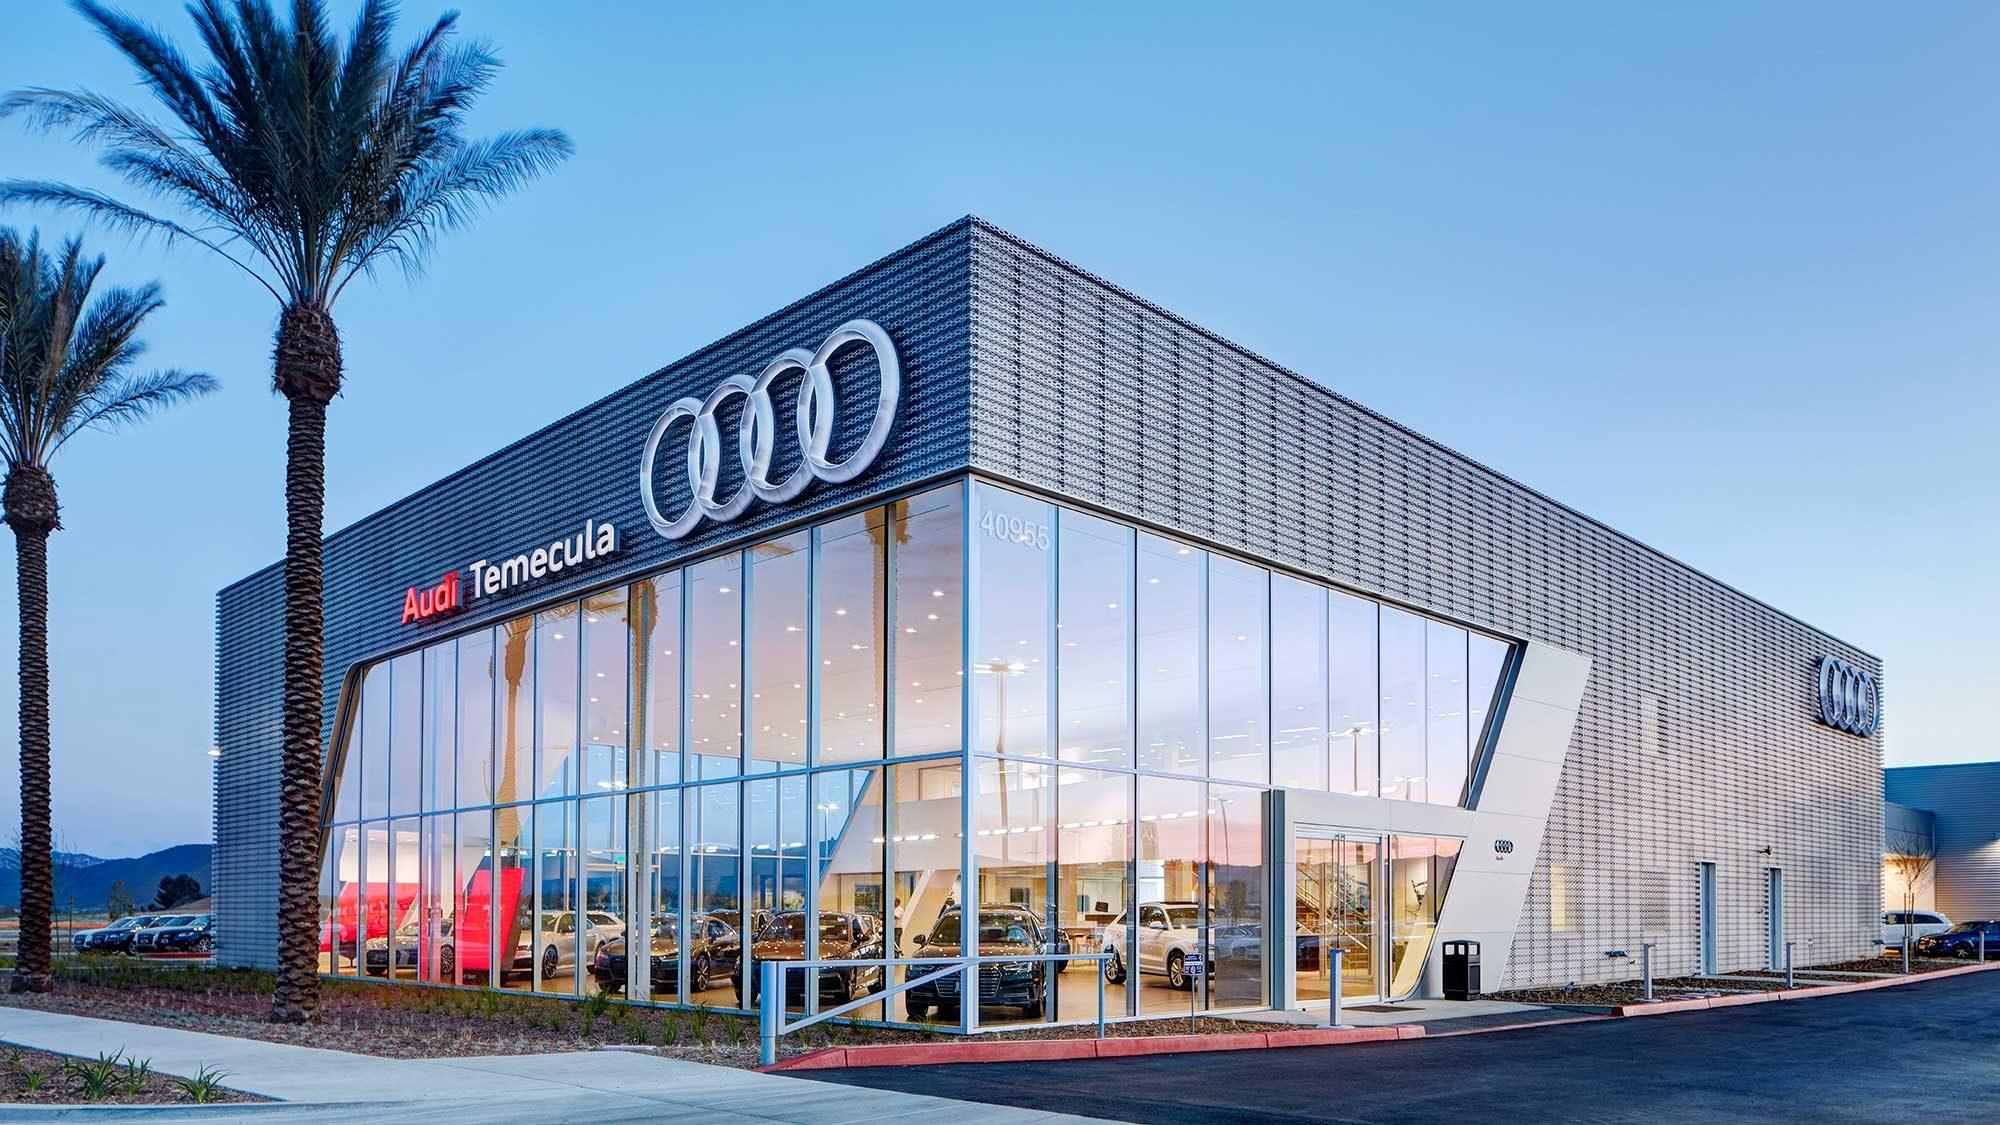 Audi, Temecula, California